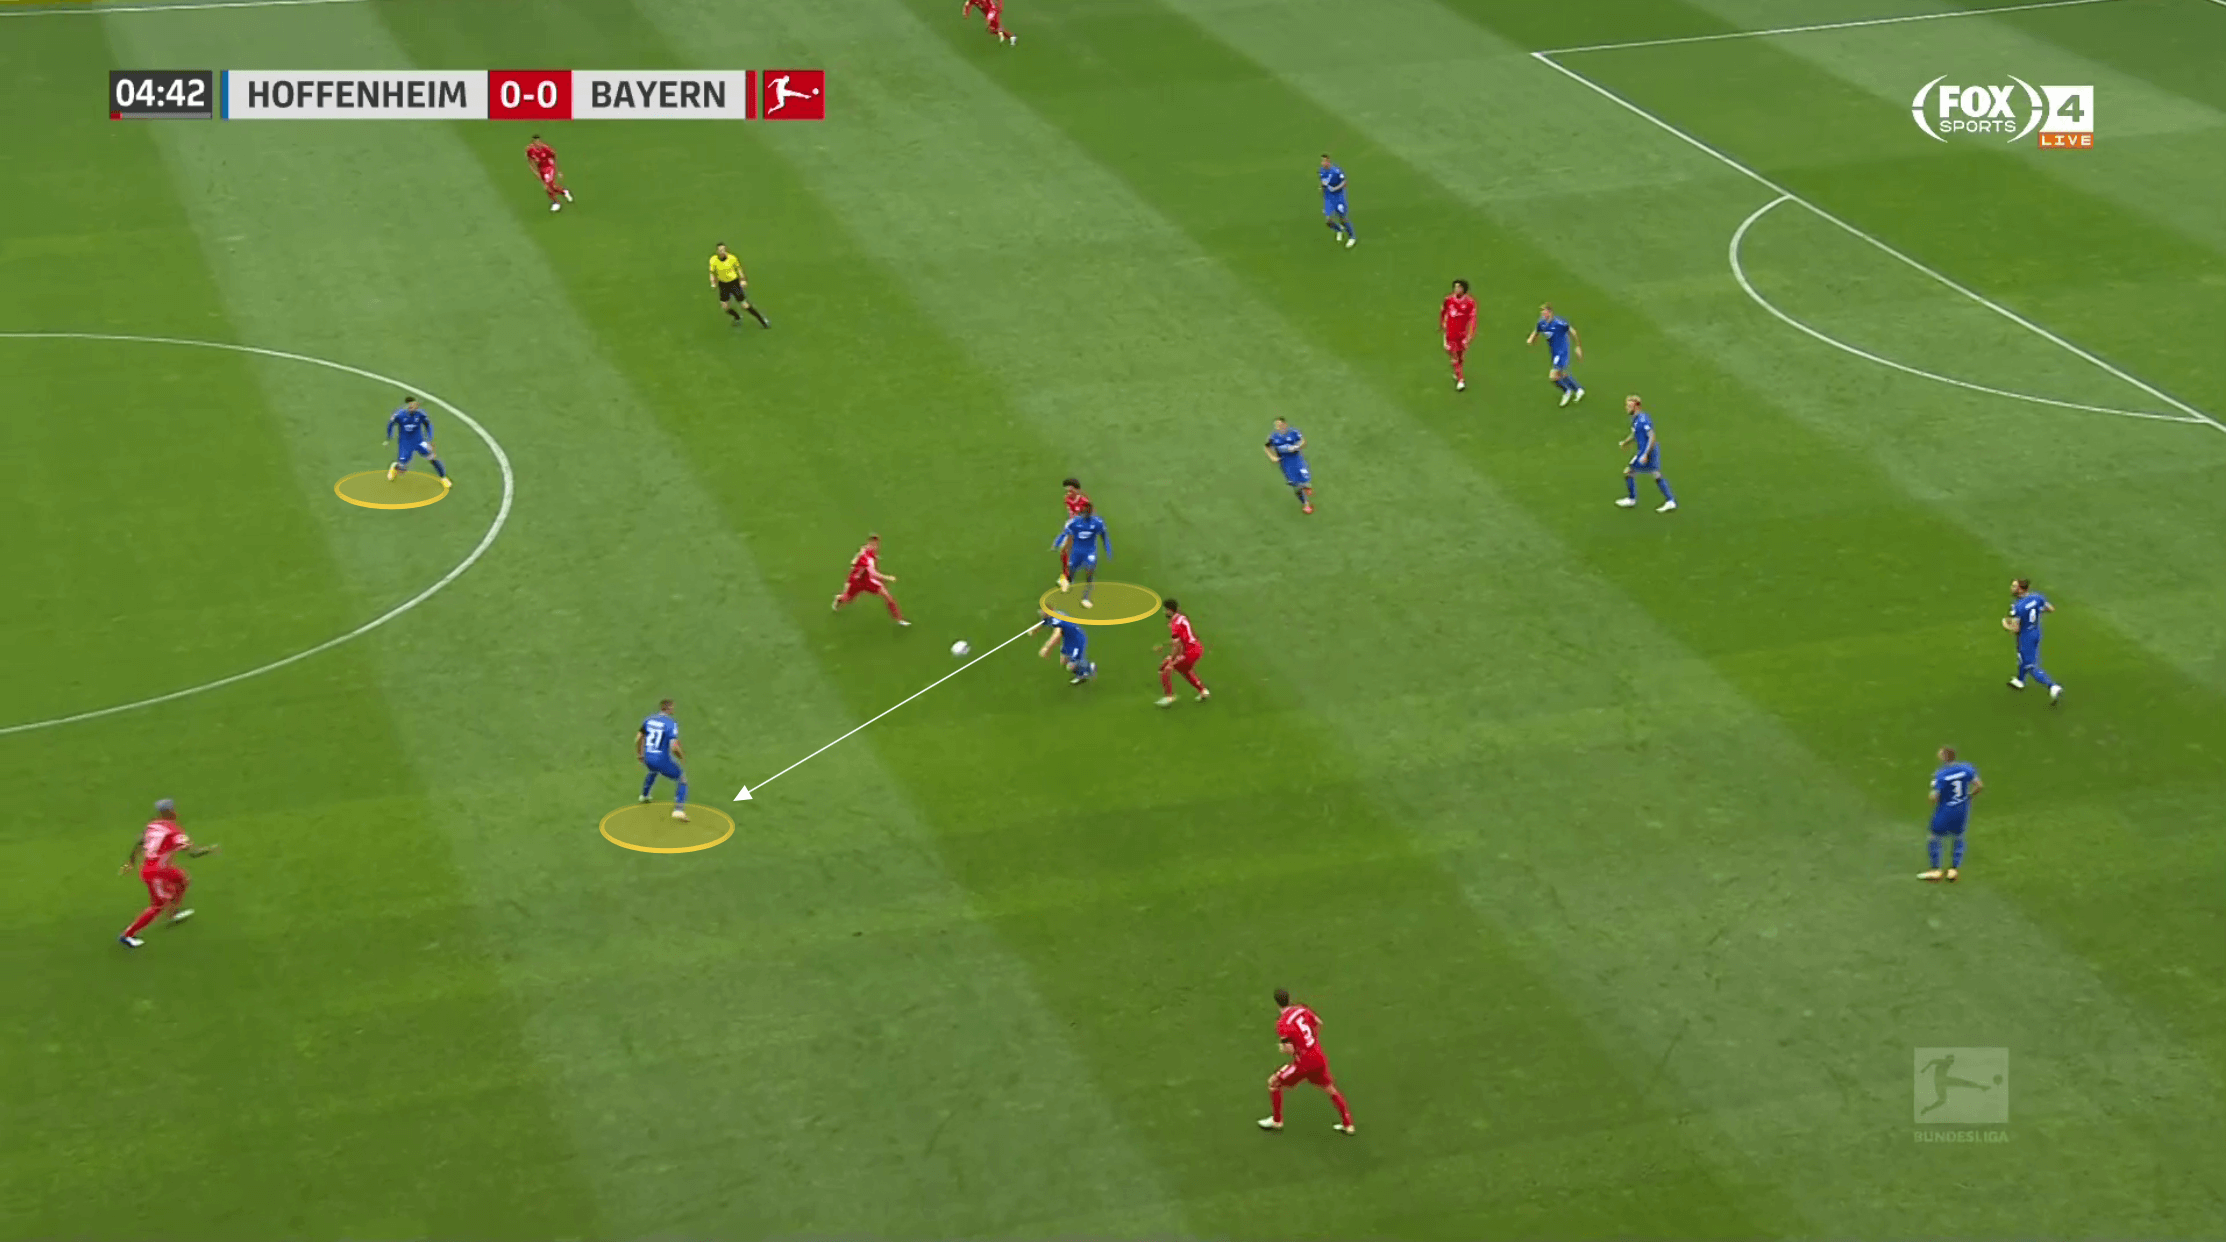 Bundesliga 2020/21: Hoffenheim vs Bayern Munich - tactical analysis tactics